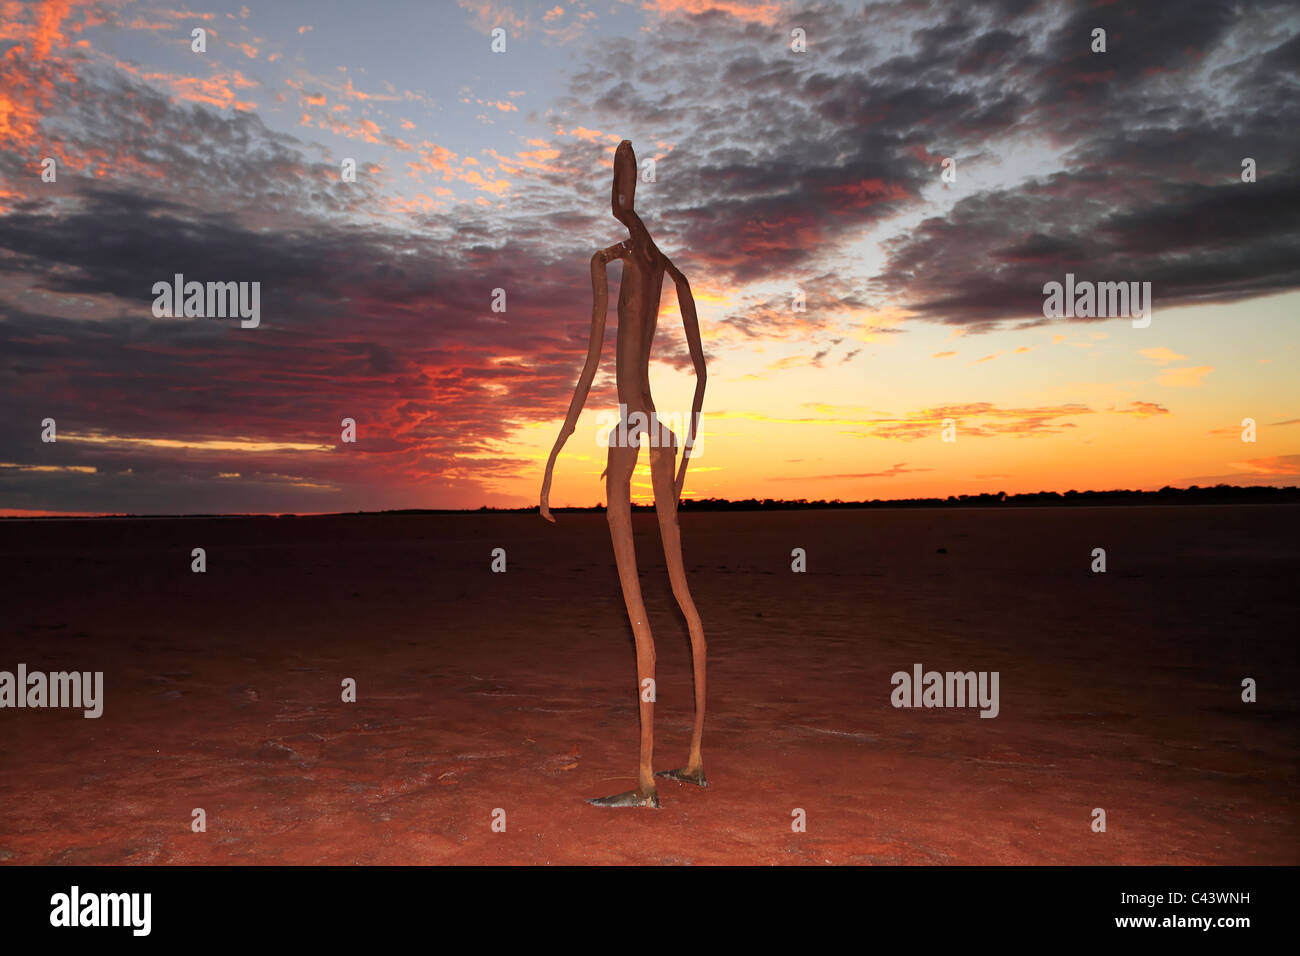 Sculpture by Antony Gormley, Inside Australia exhibition, on Lake Ballard at sunrise, Western Australia Stock Photo